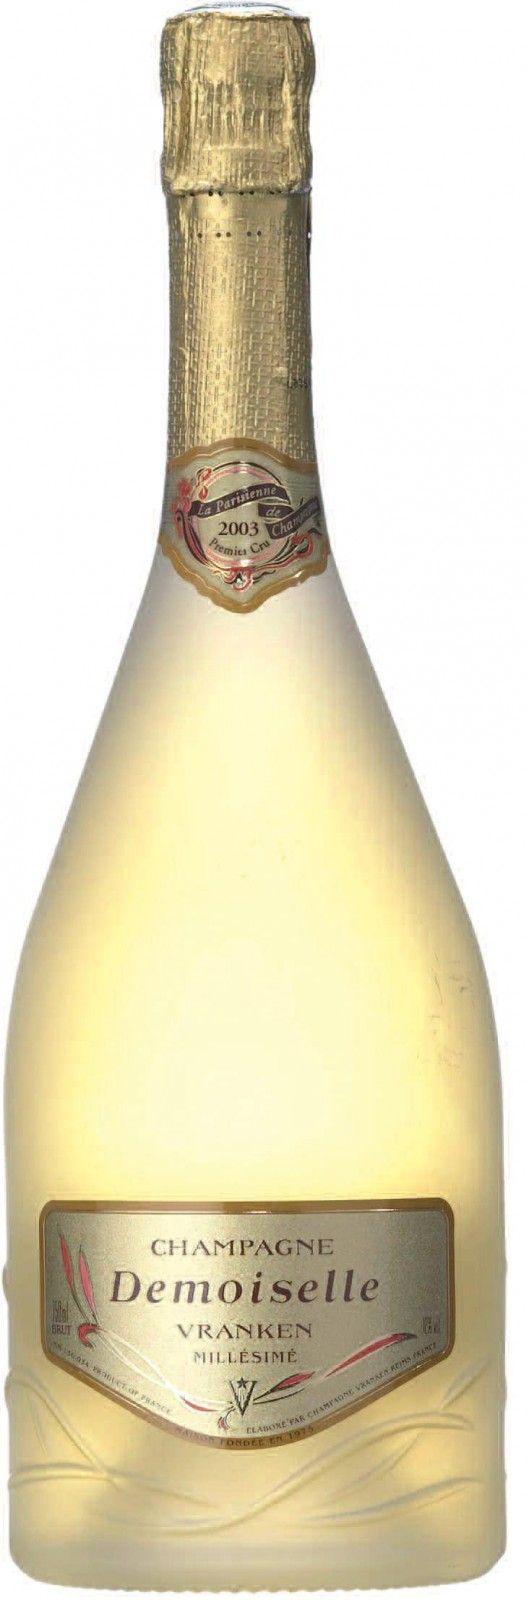 Champagne Vranken - La Demoiselle Parisienne